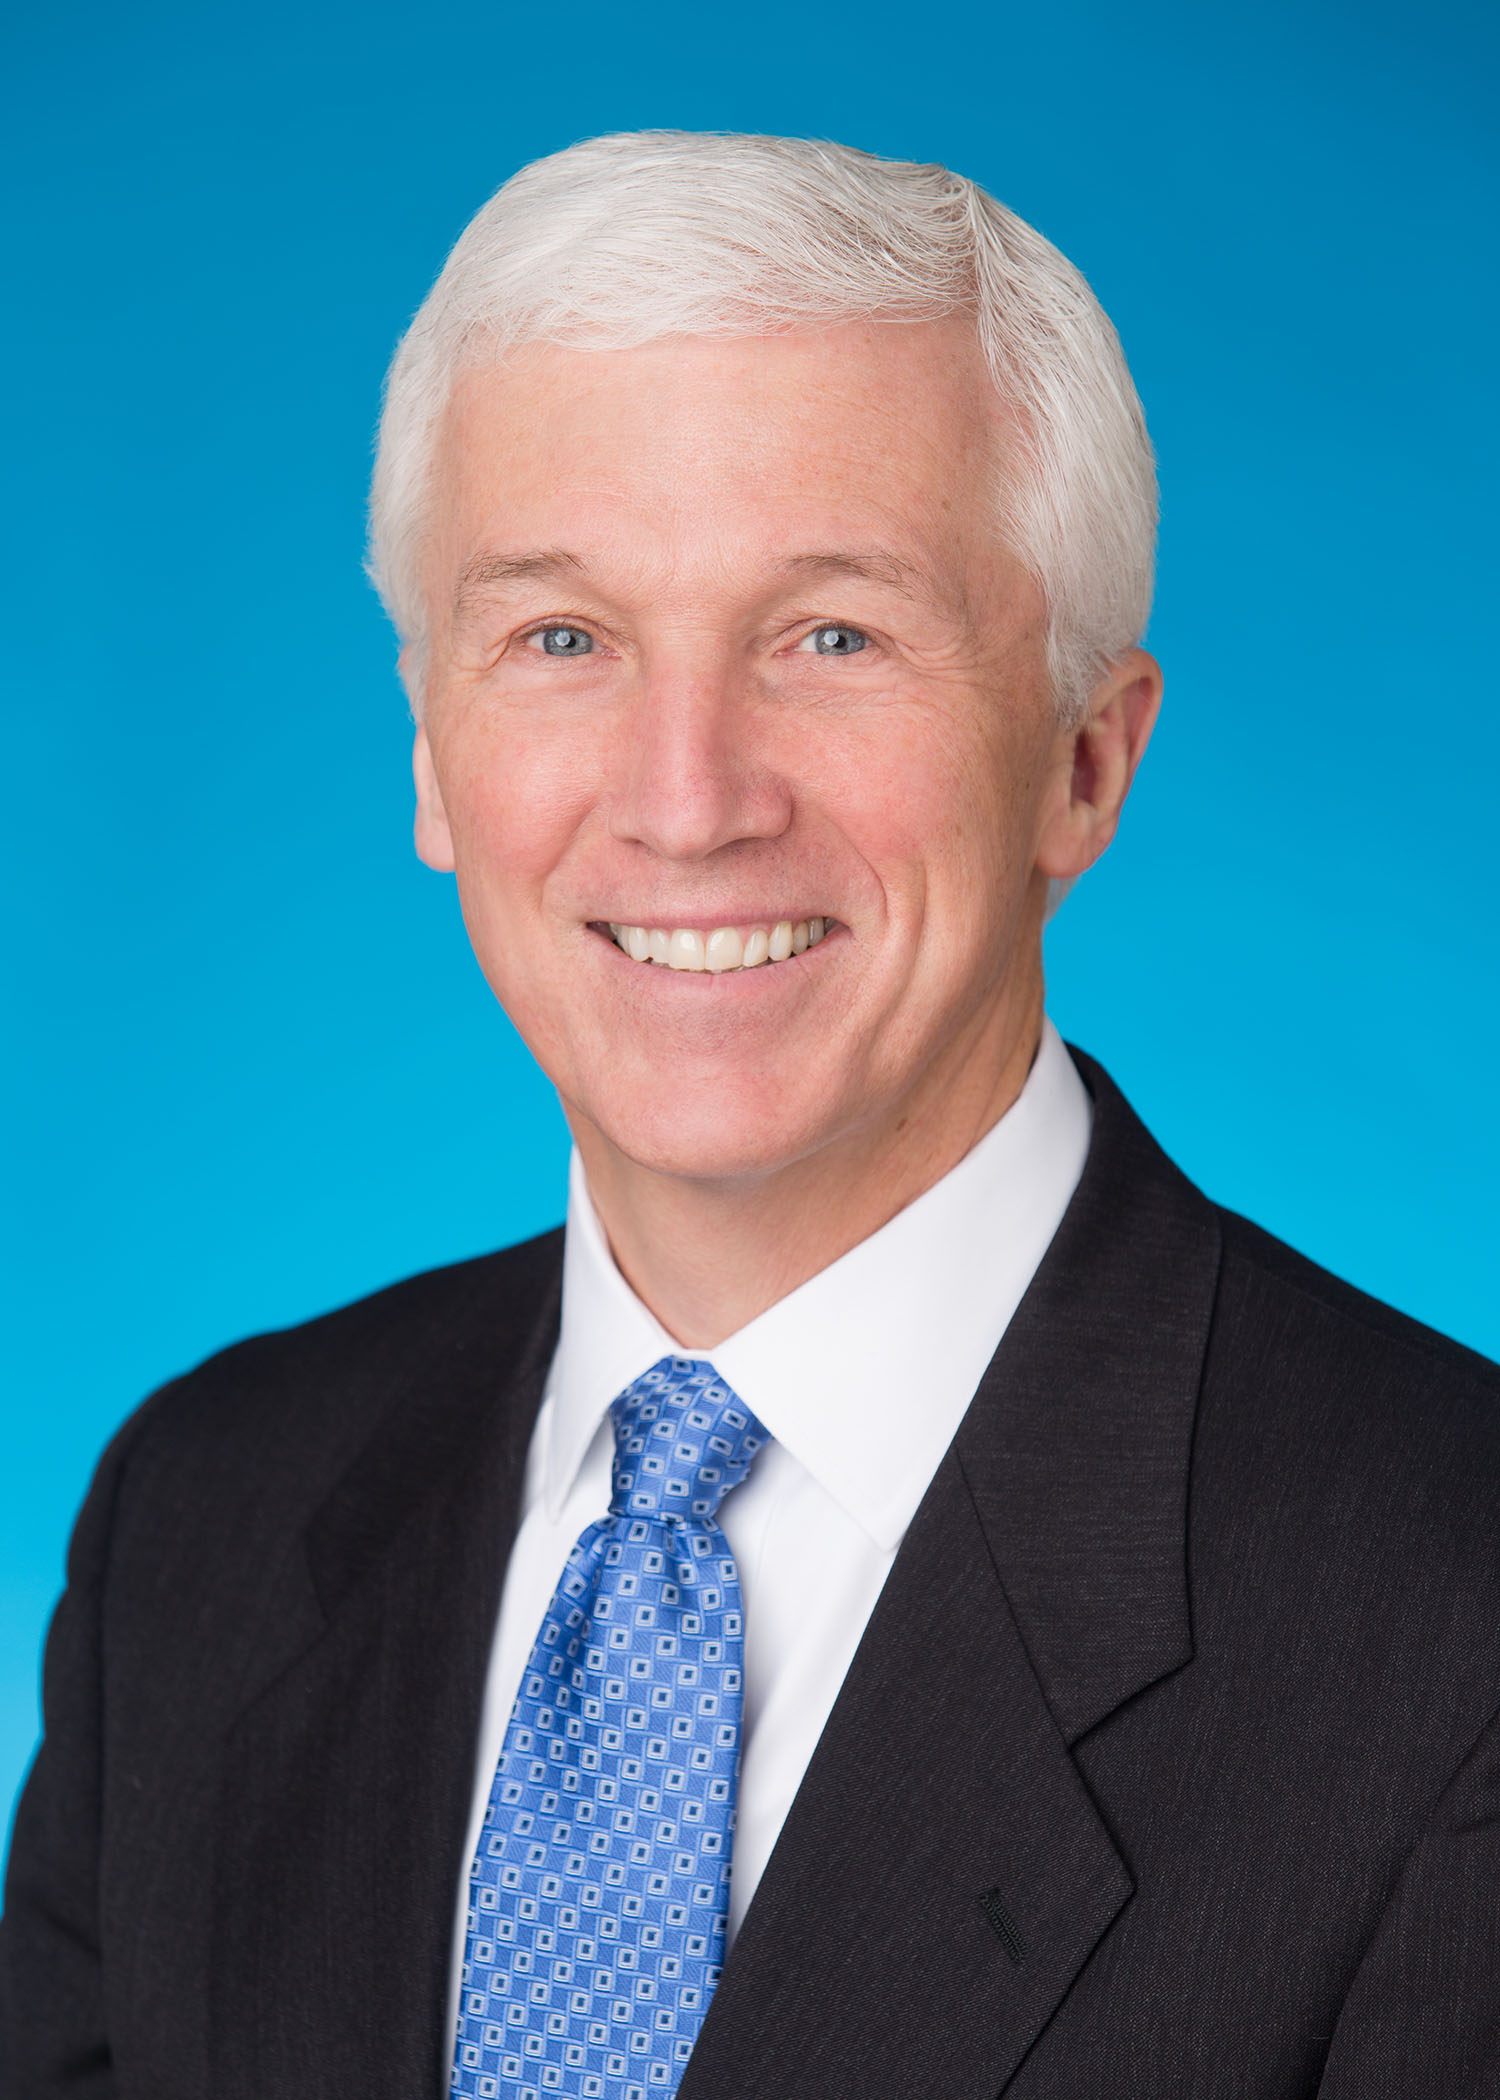 Dan Rashin, The Rockefeller Group